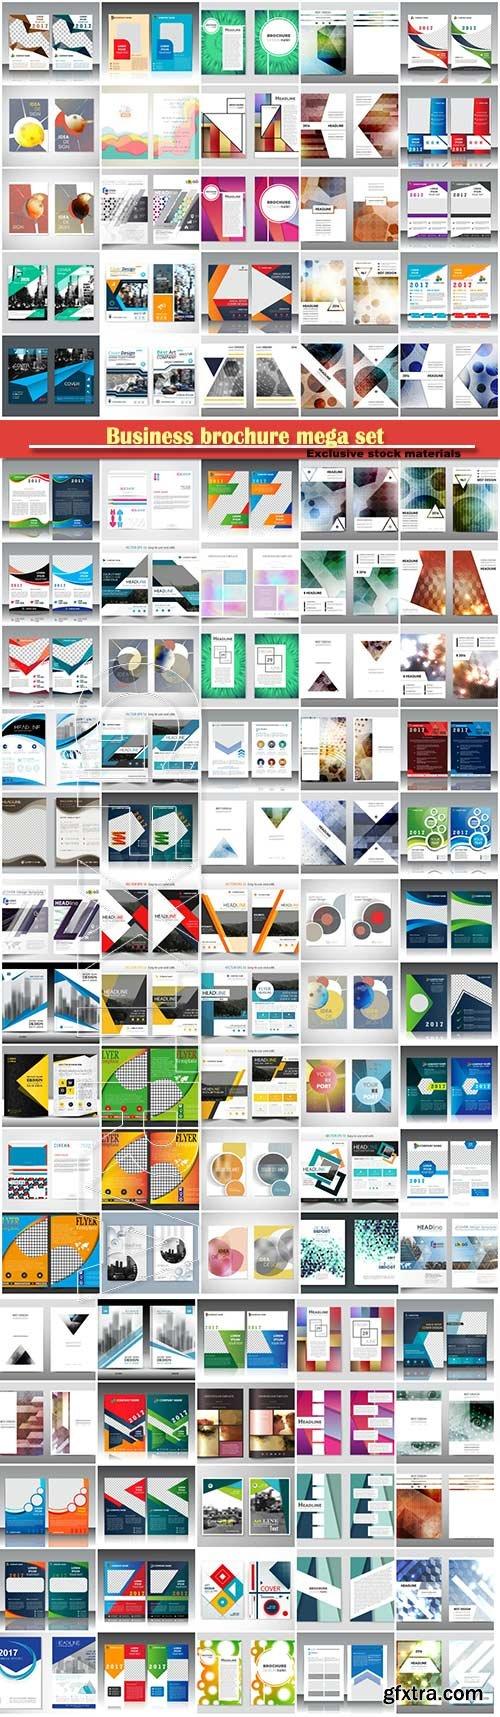 Business brochure mega set, vector flyers template # 2